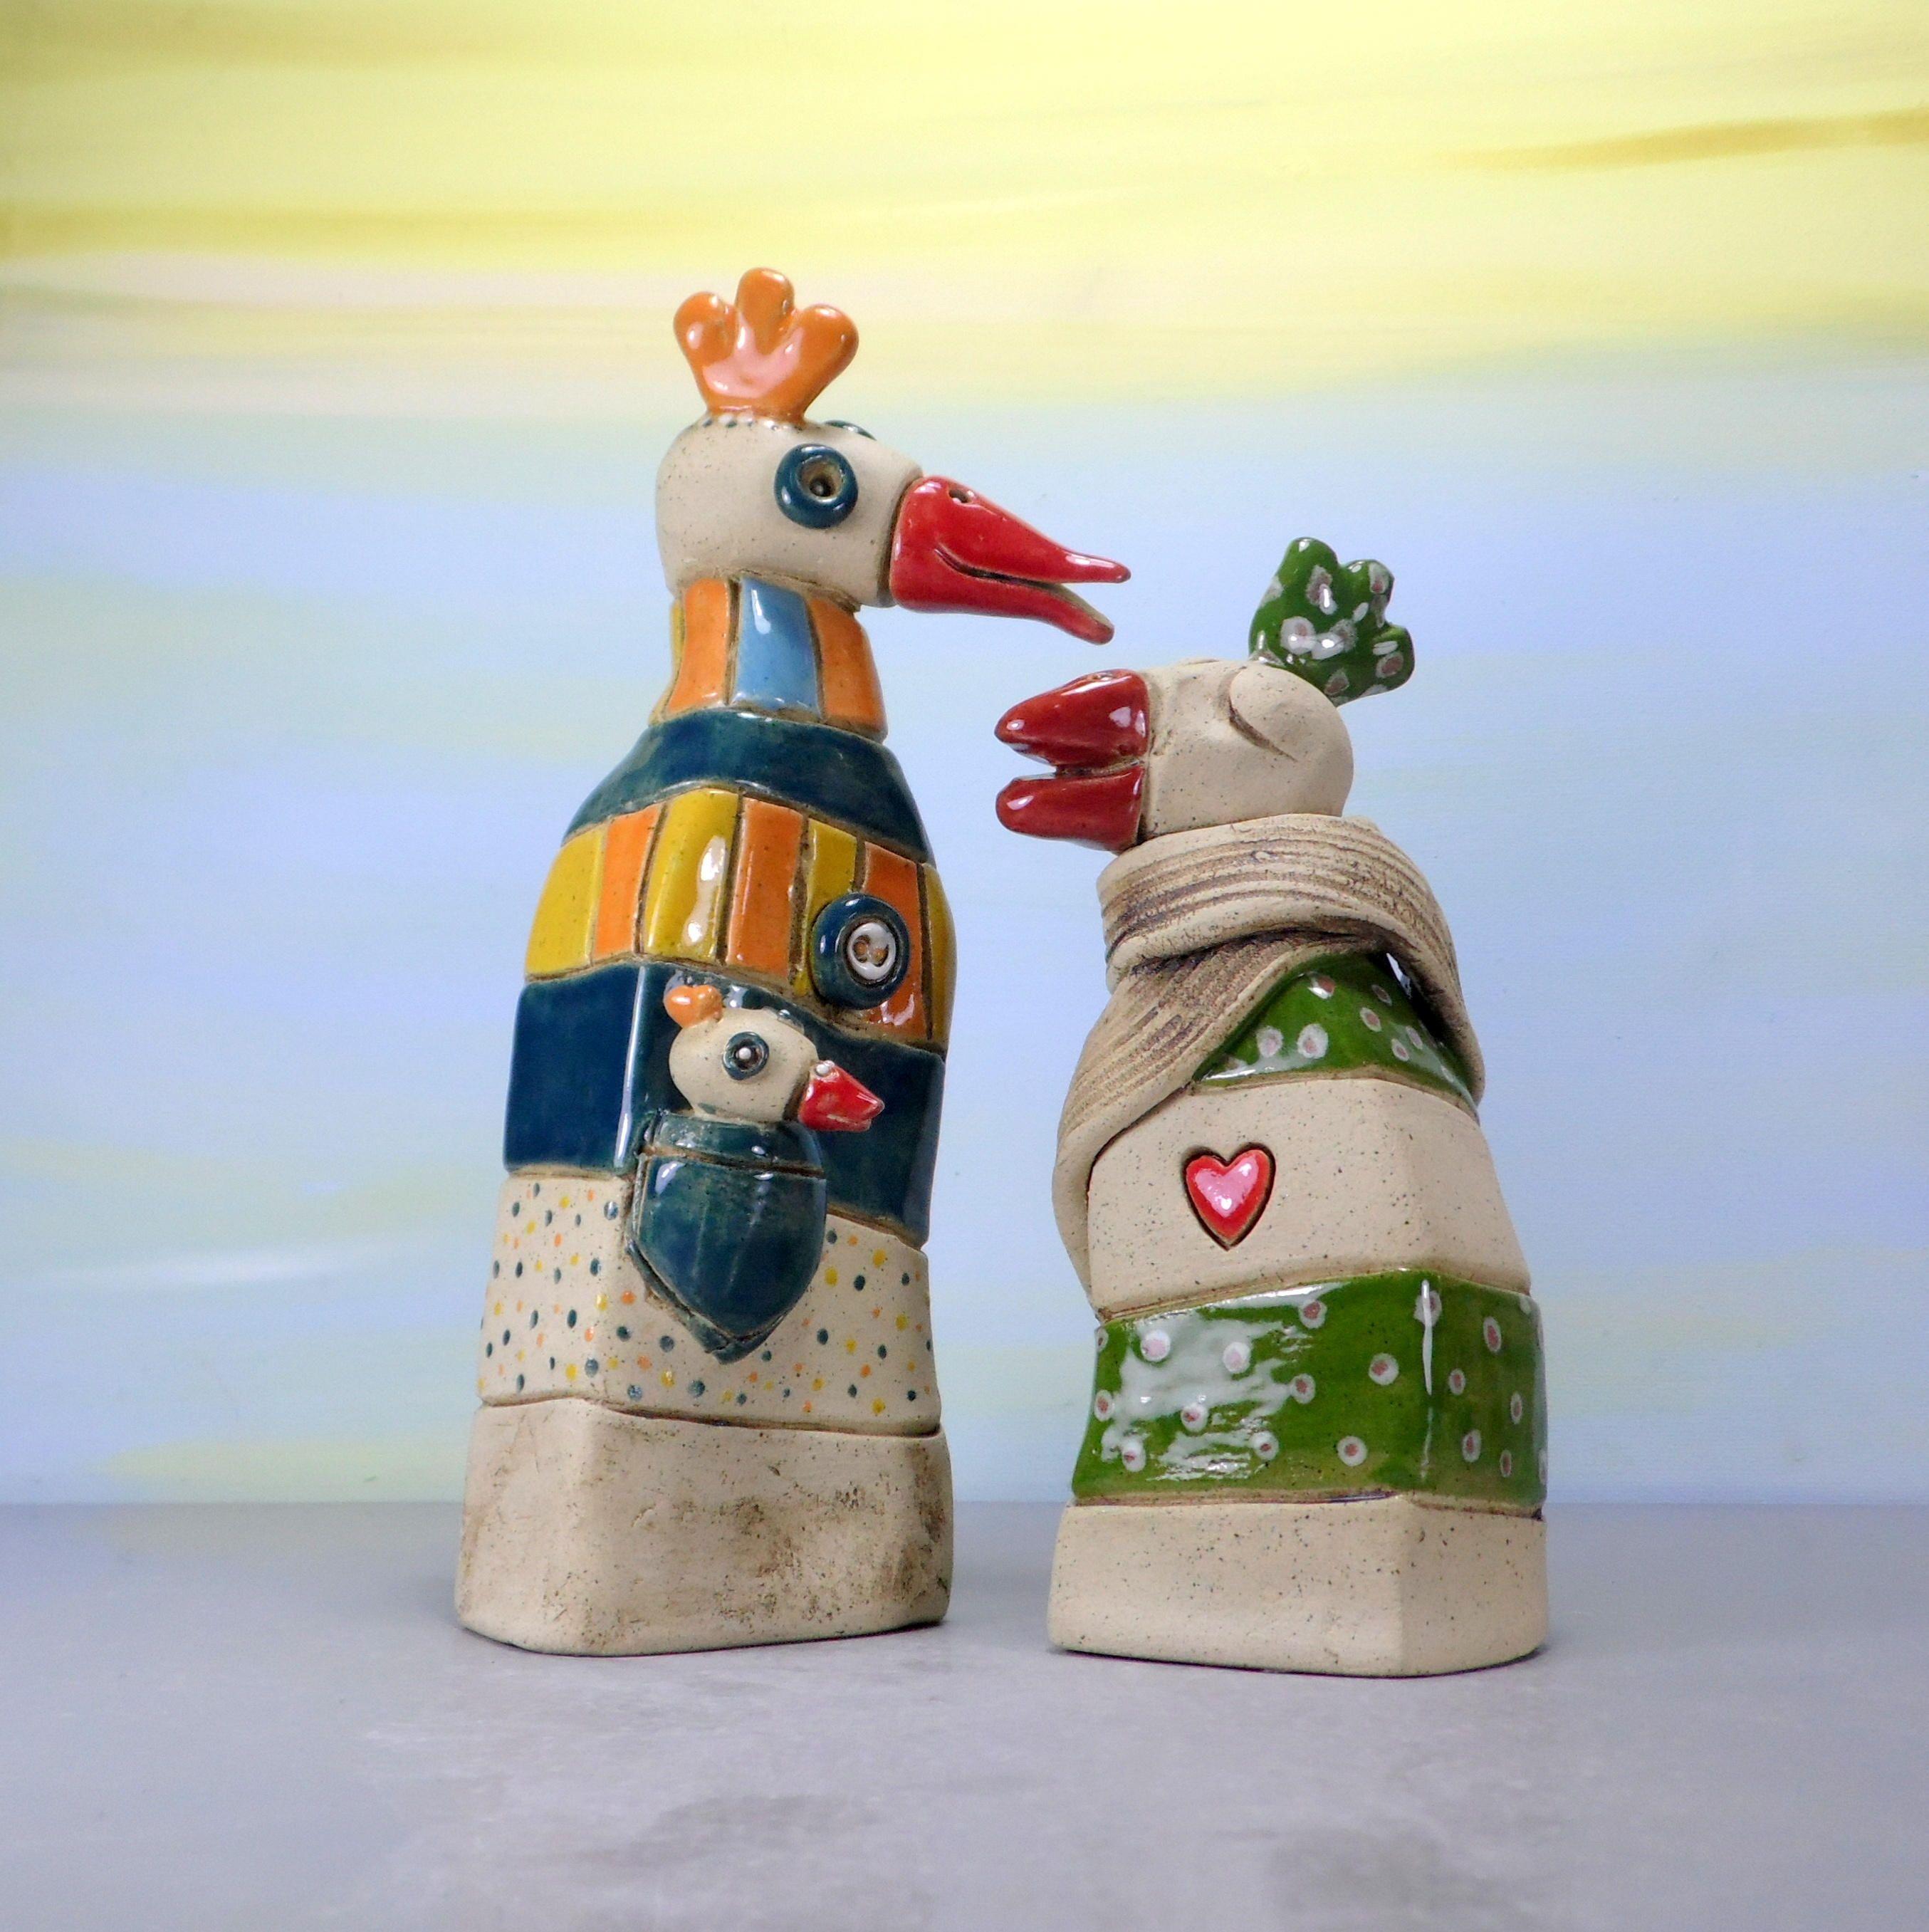 Set Of 2 Birds Sculpture Ceramic Birds Ceramic Sculpture Whimsical Animal Clay Birds Chicken Decor Bird Decor Dodo Bird Home Decor By Ceramic Birds Bird Sculpture Clay Birds